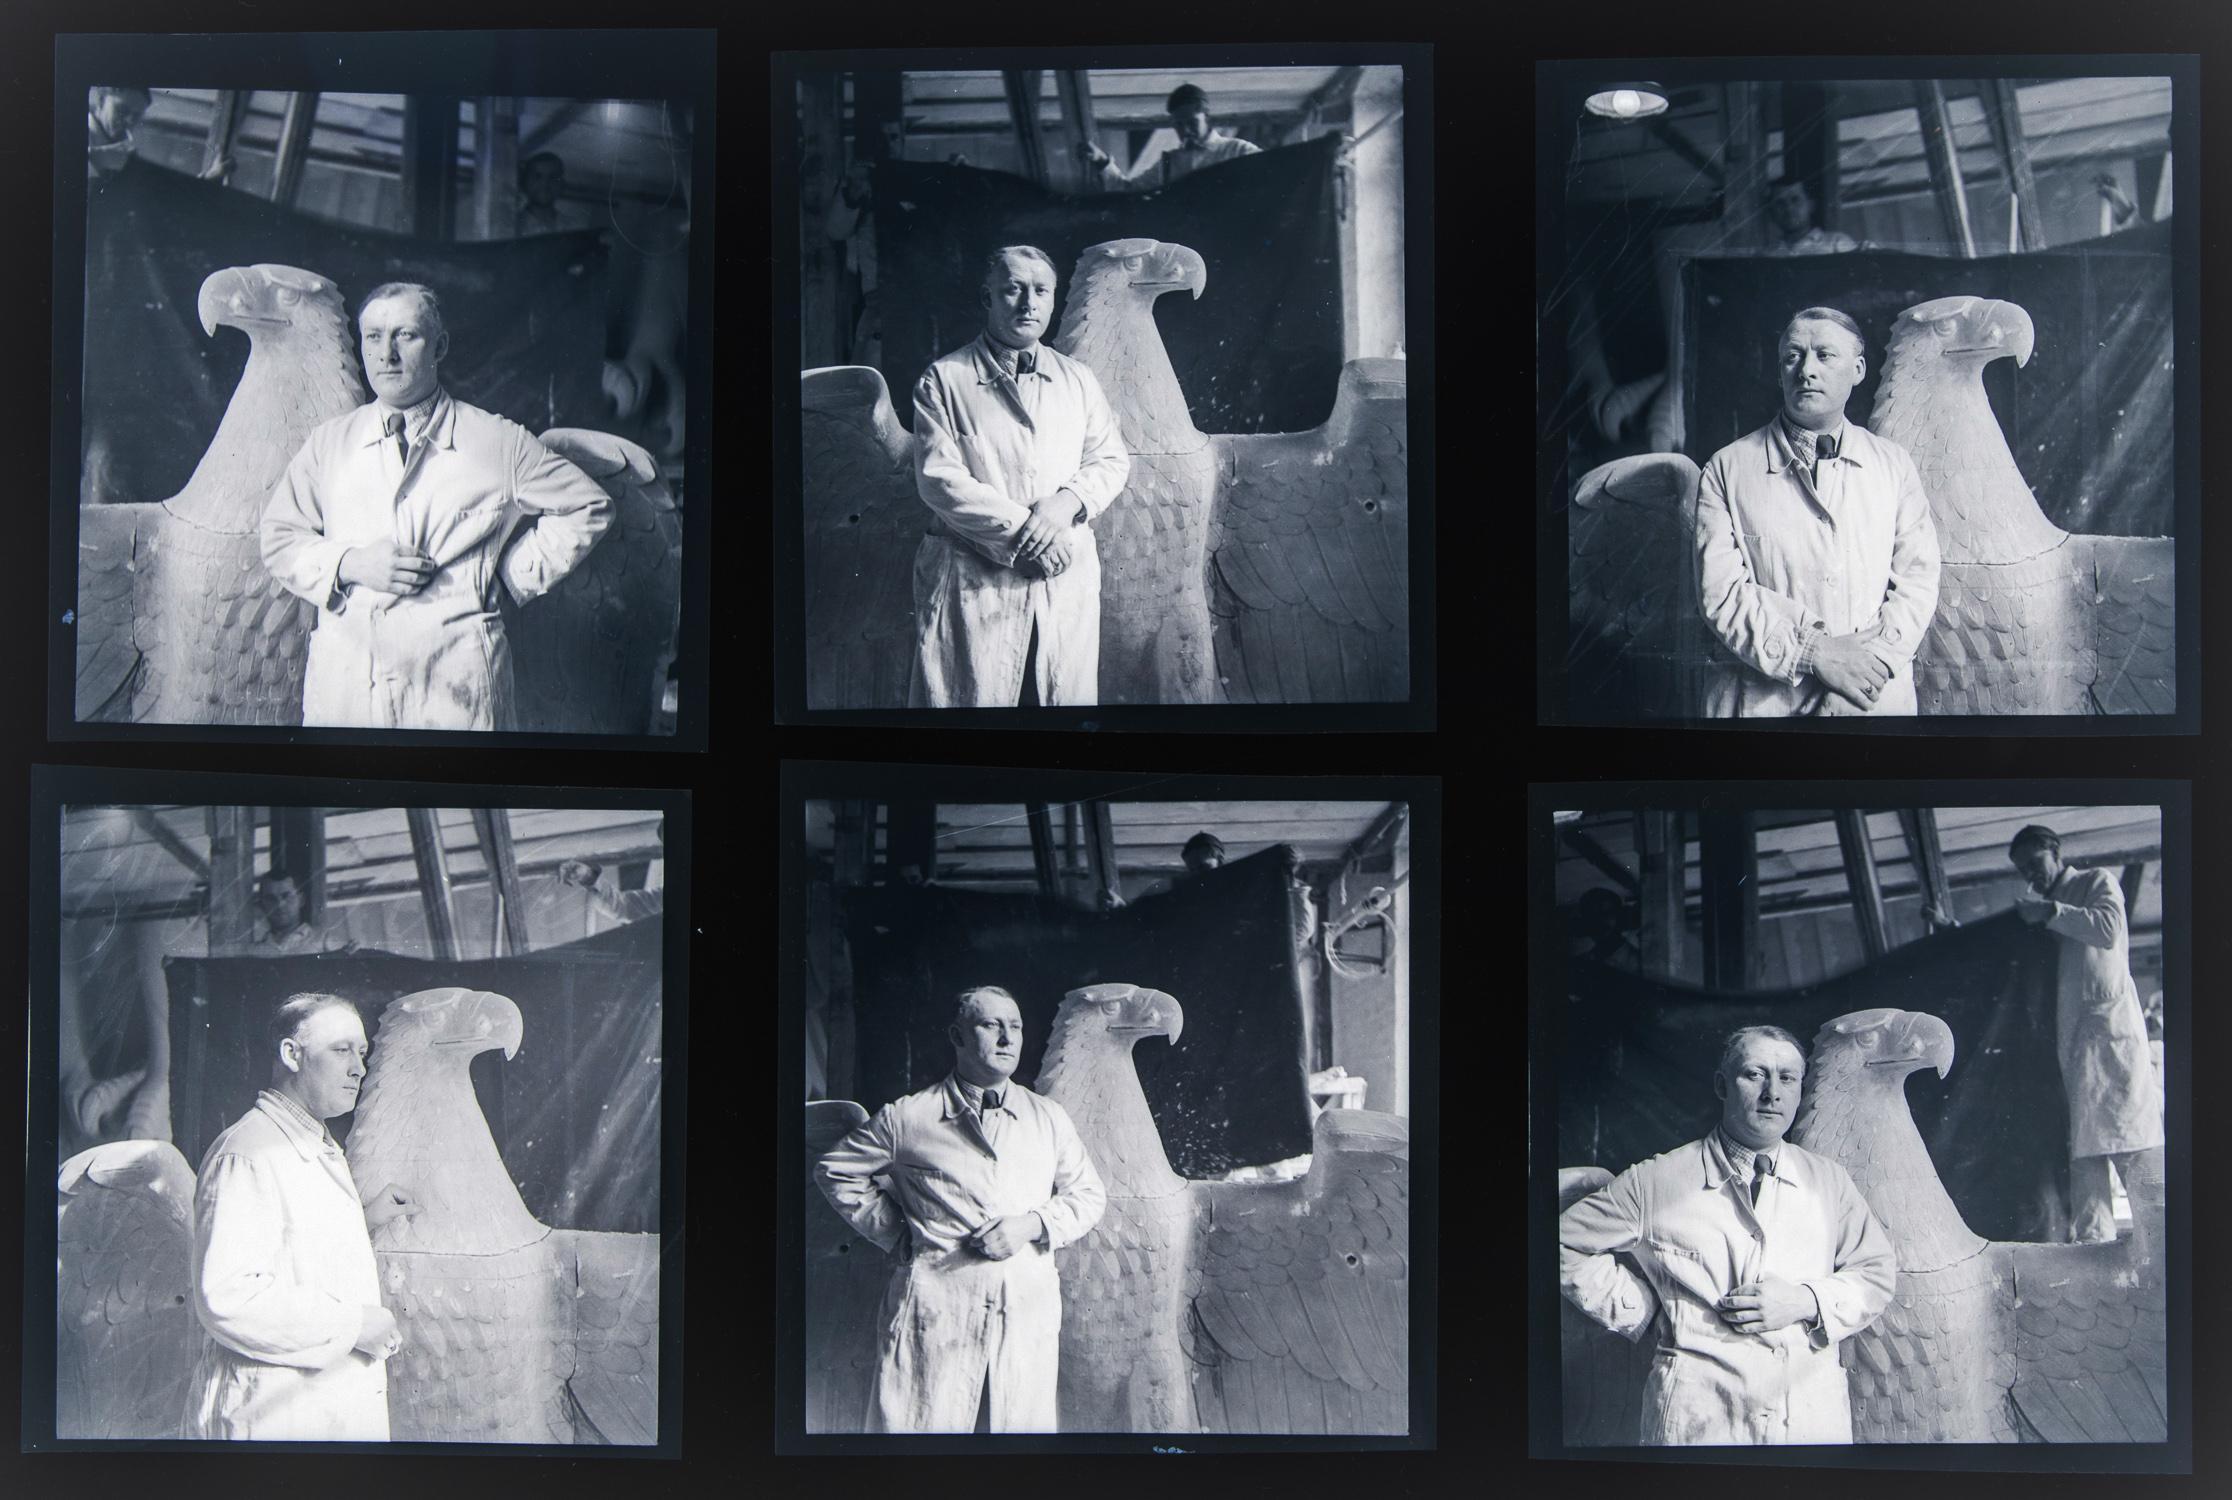 KURT SCHMID EHMEN PHOTOGRAPH NEGATIVE ARCHIVE - CREATOR OF THE NAZI EAGLE